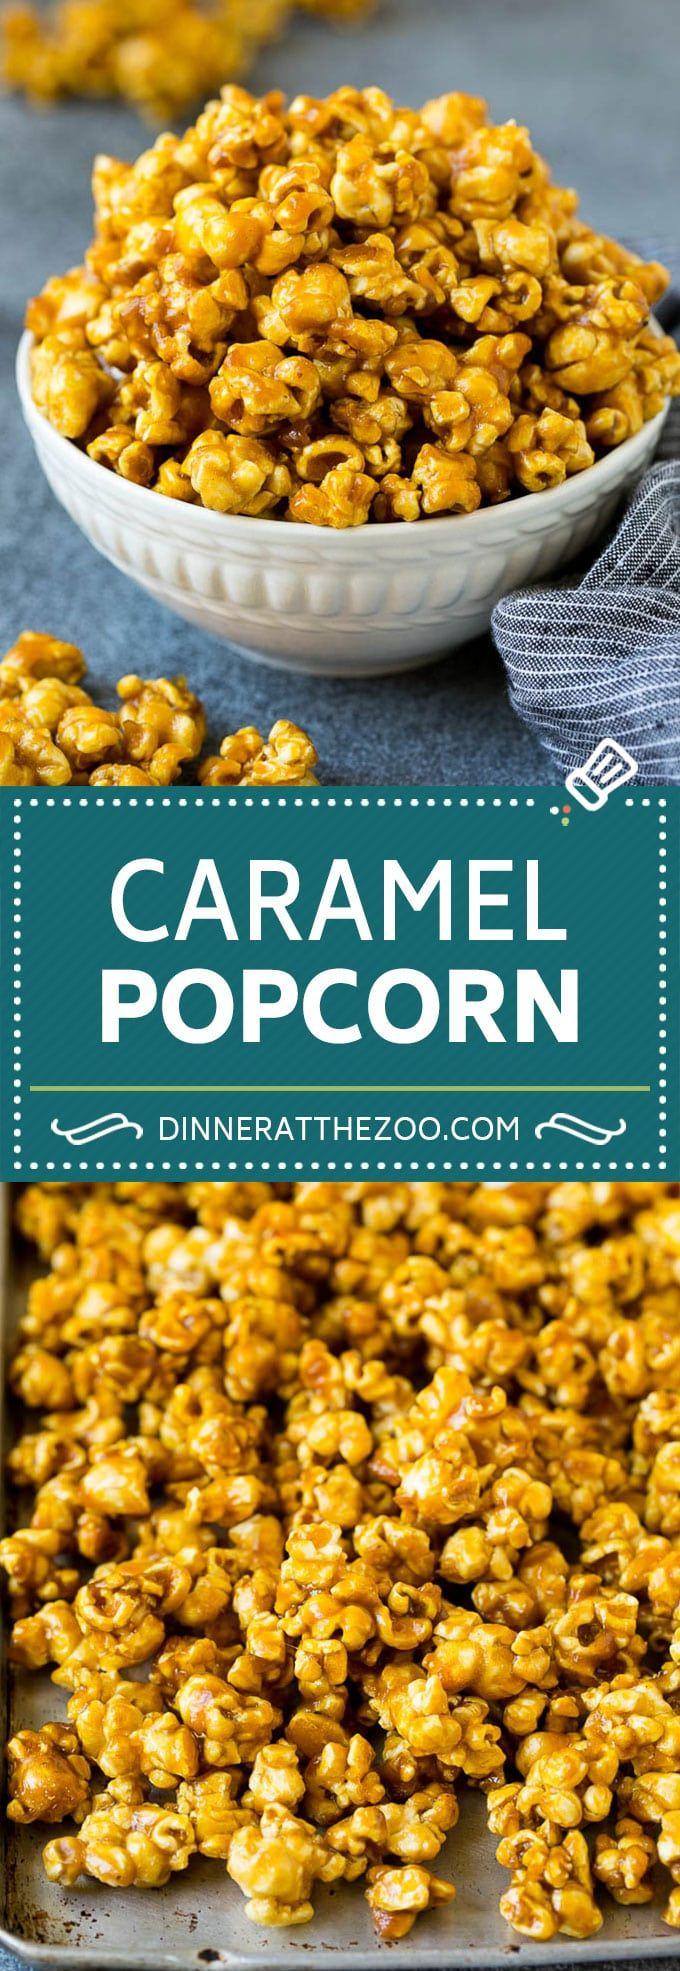 Caramel Popcorn Recipe Caramel Corn Popcorn Caramel Snack Dessert Dinneratthezoo Popcorn Recipes Caramel Popcorn Recipes Sweet Snacks